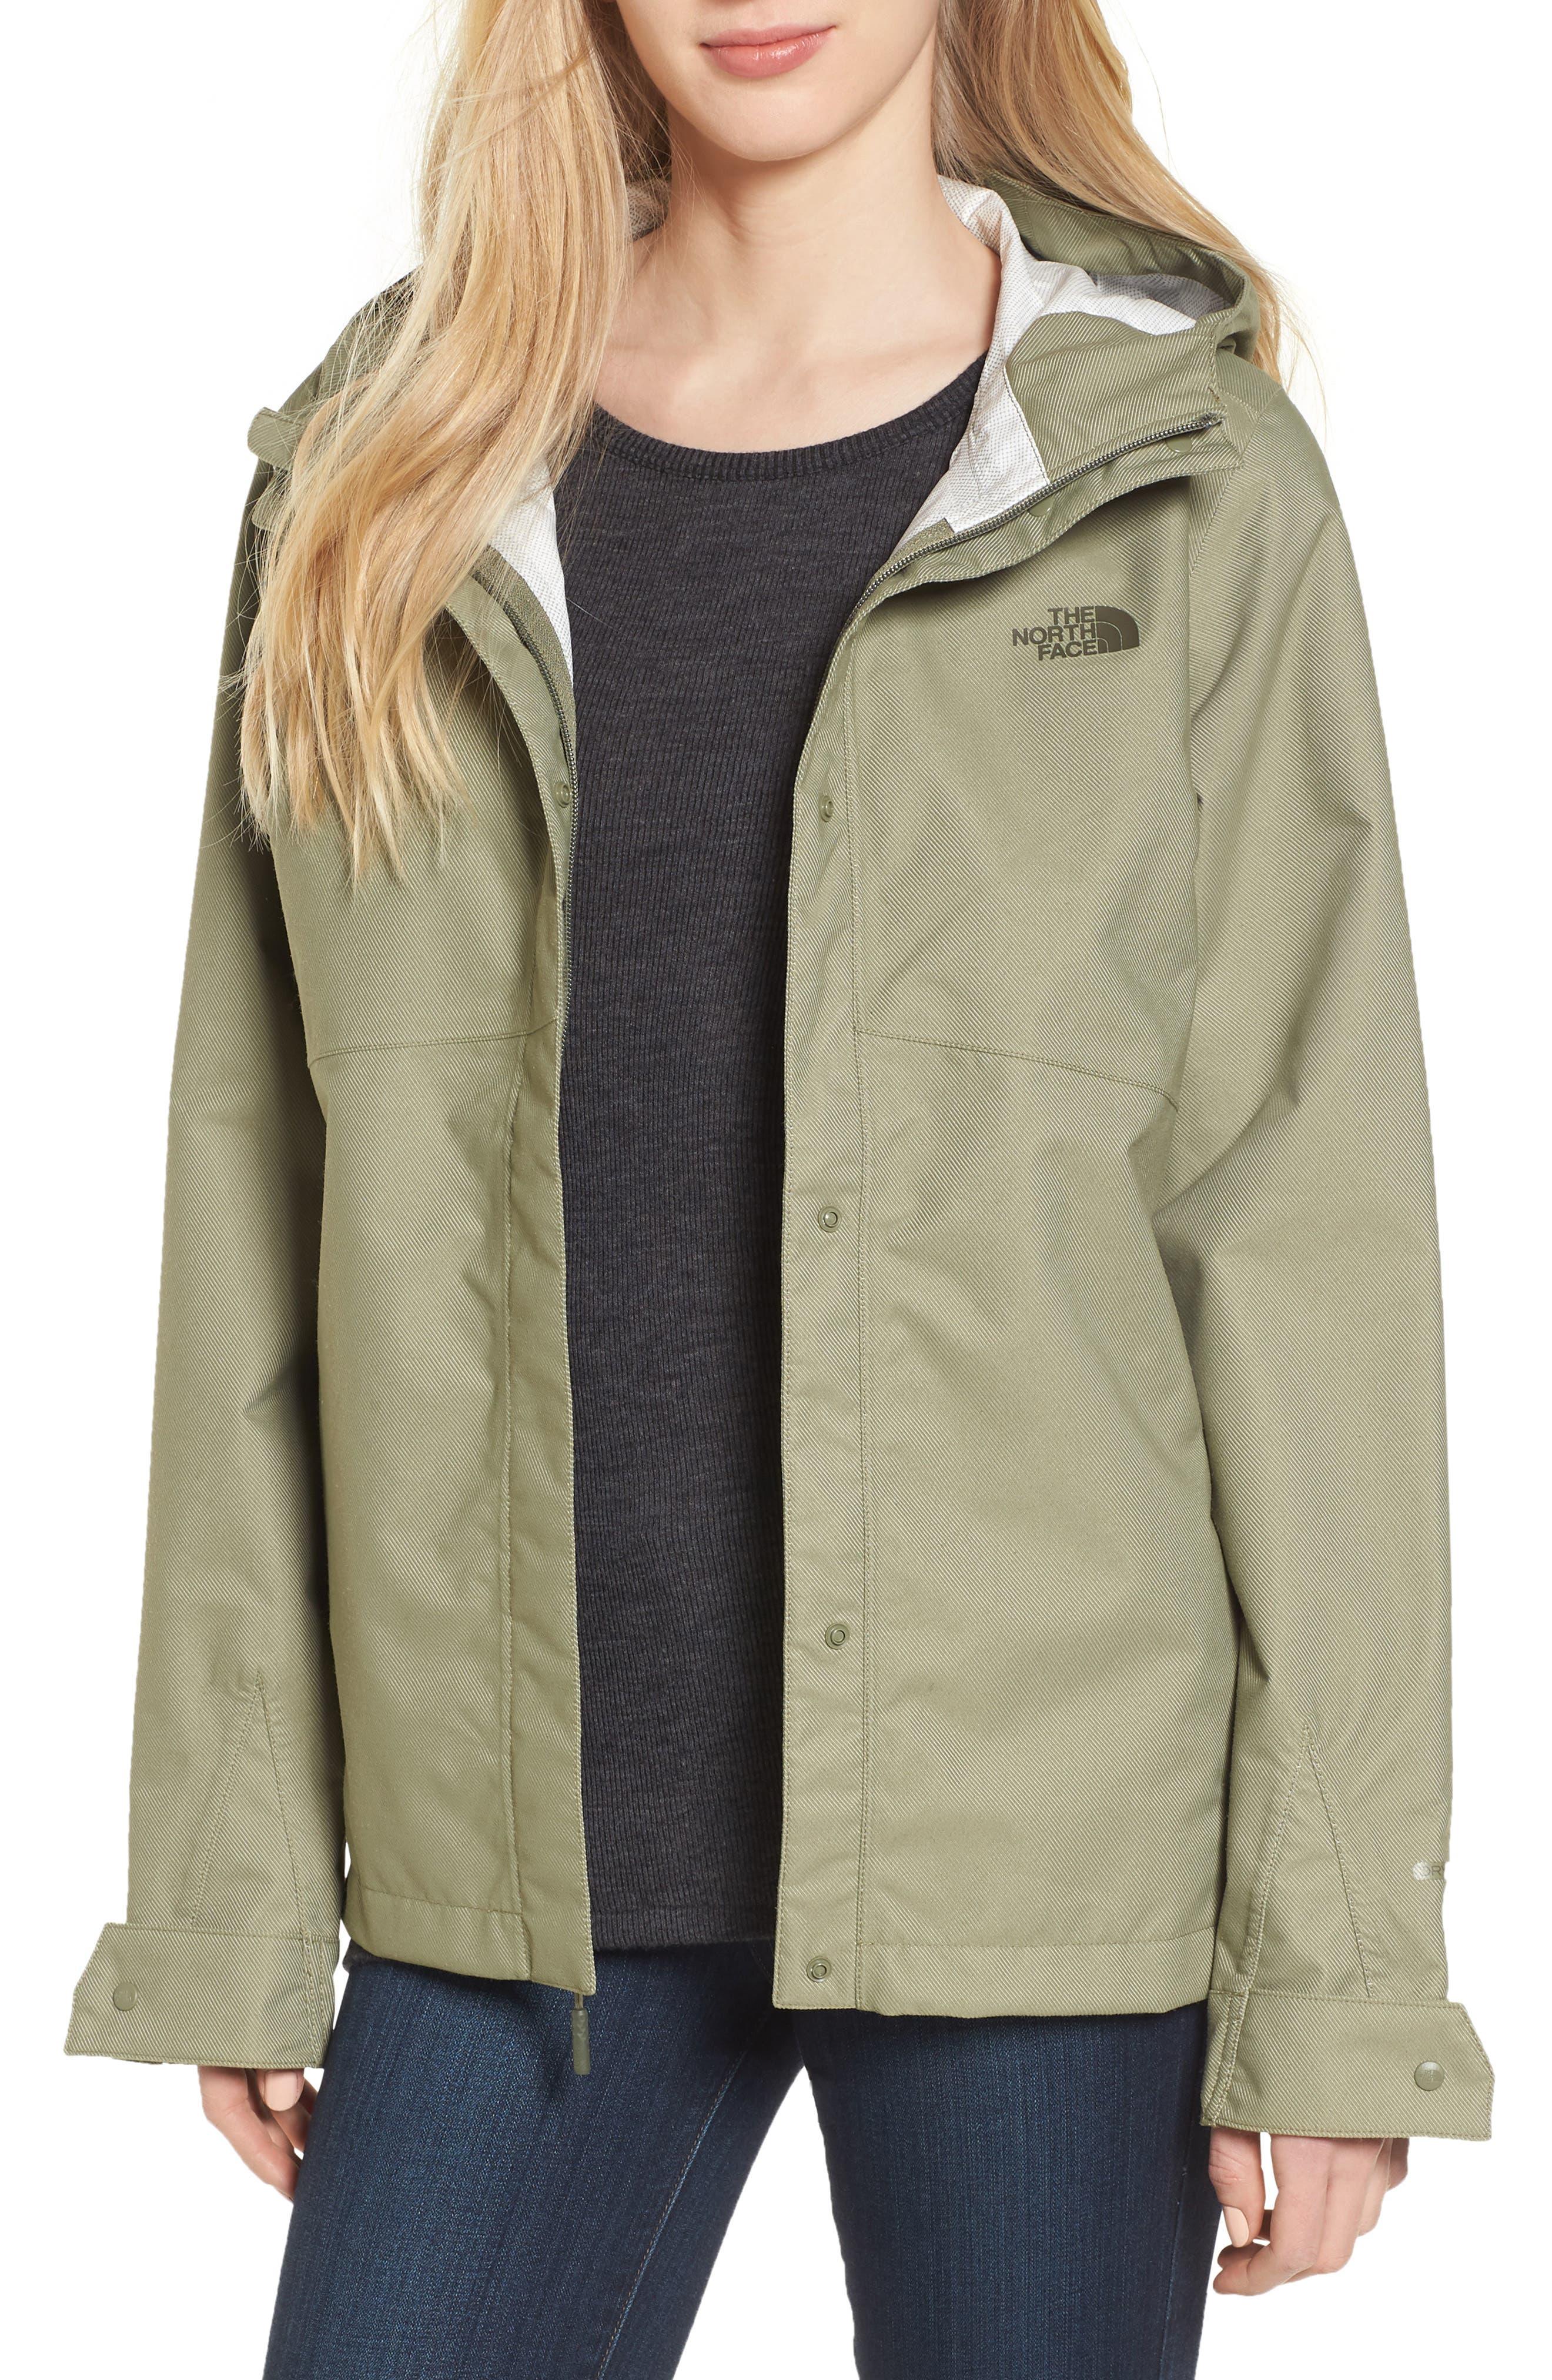 Berrien Waterproof Jacket,                             Main thumbnail 1, color,                             301